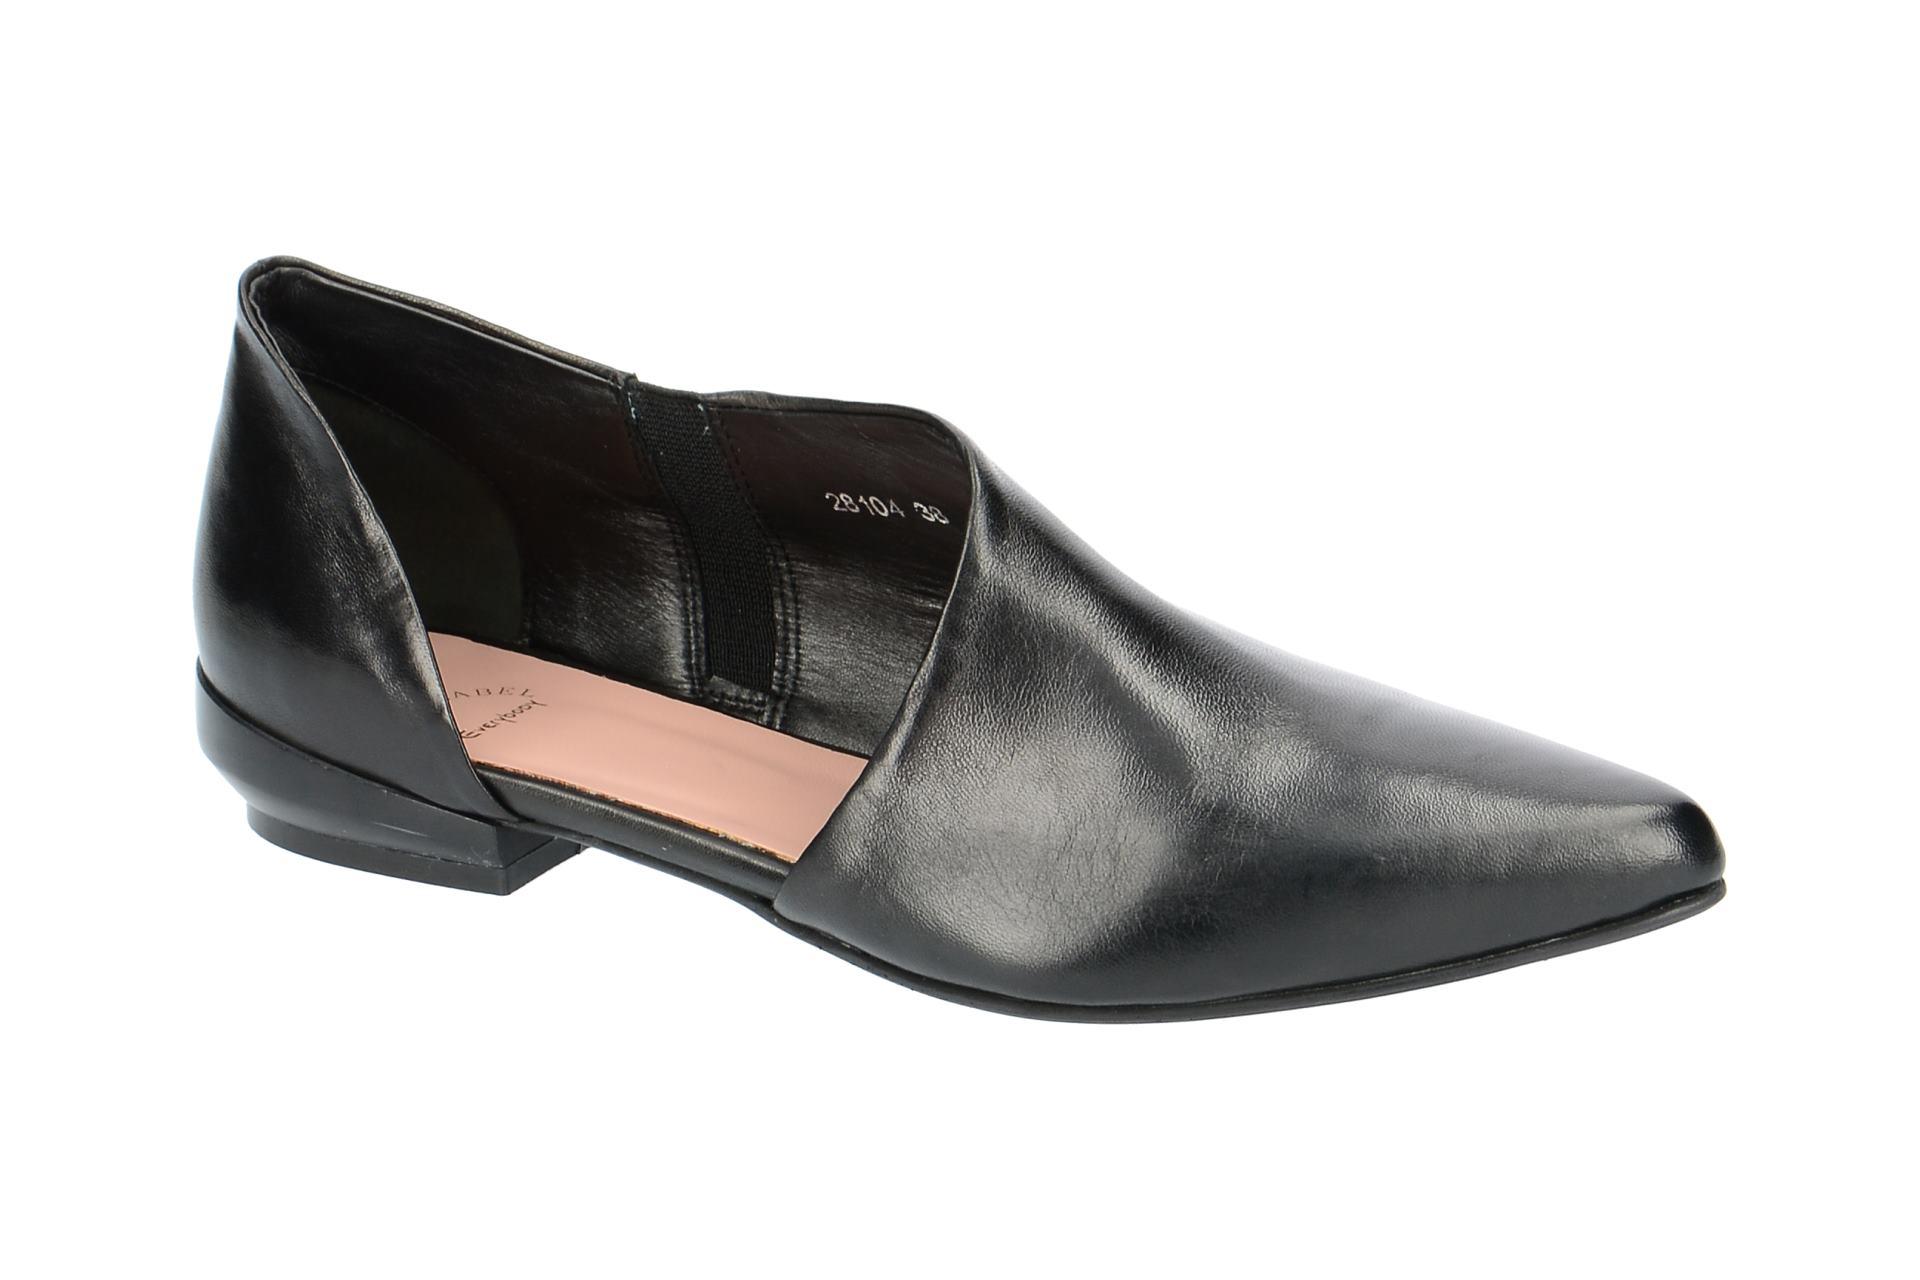 45951f6cf2f913 Everybody Schuhe 28104 schwarz Damenschuhe elegante Slipper ...